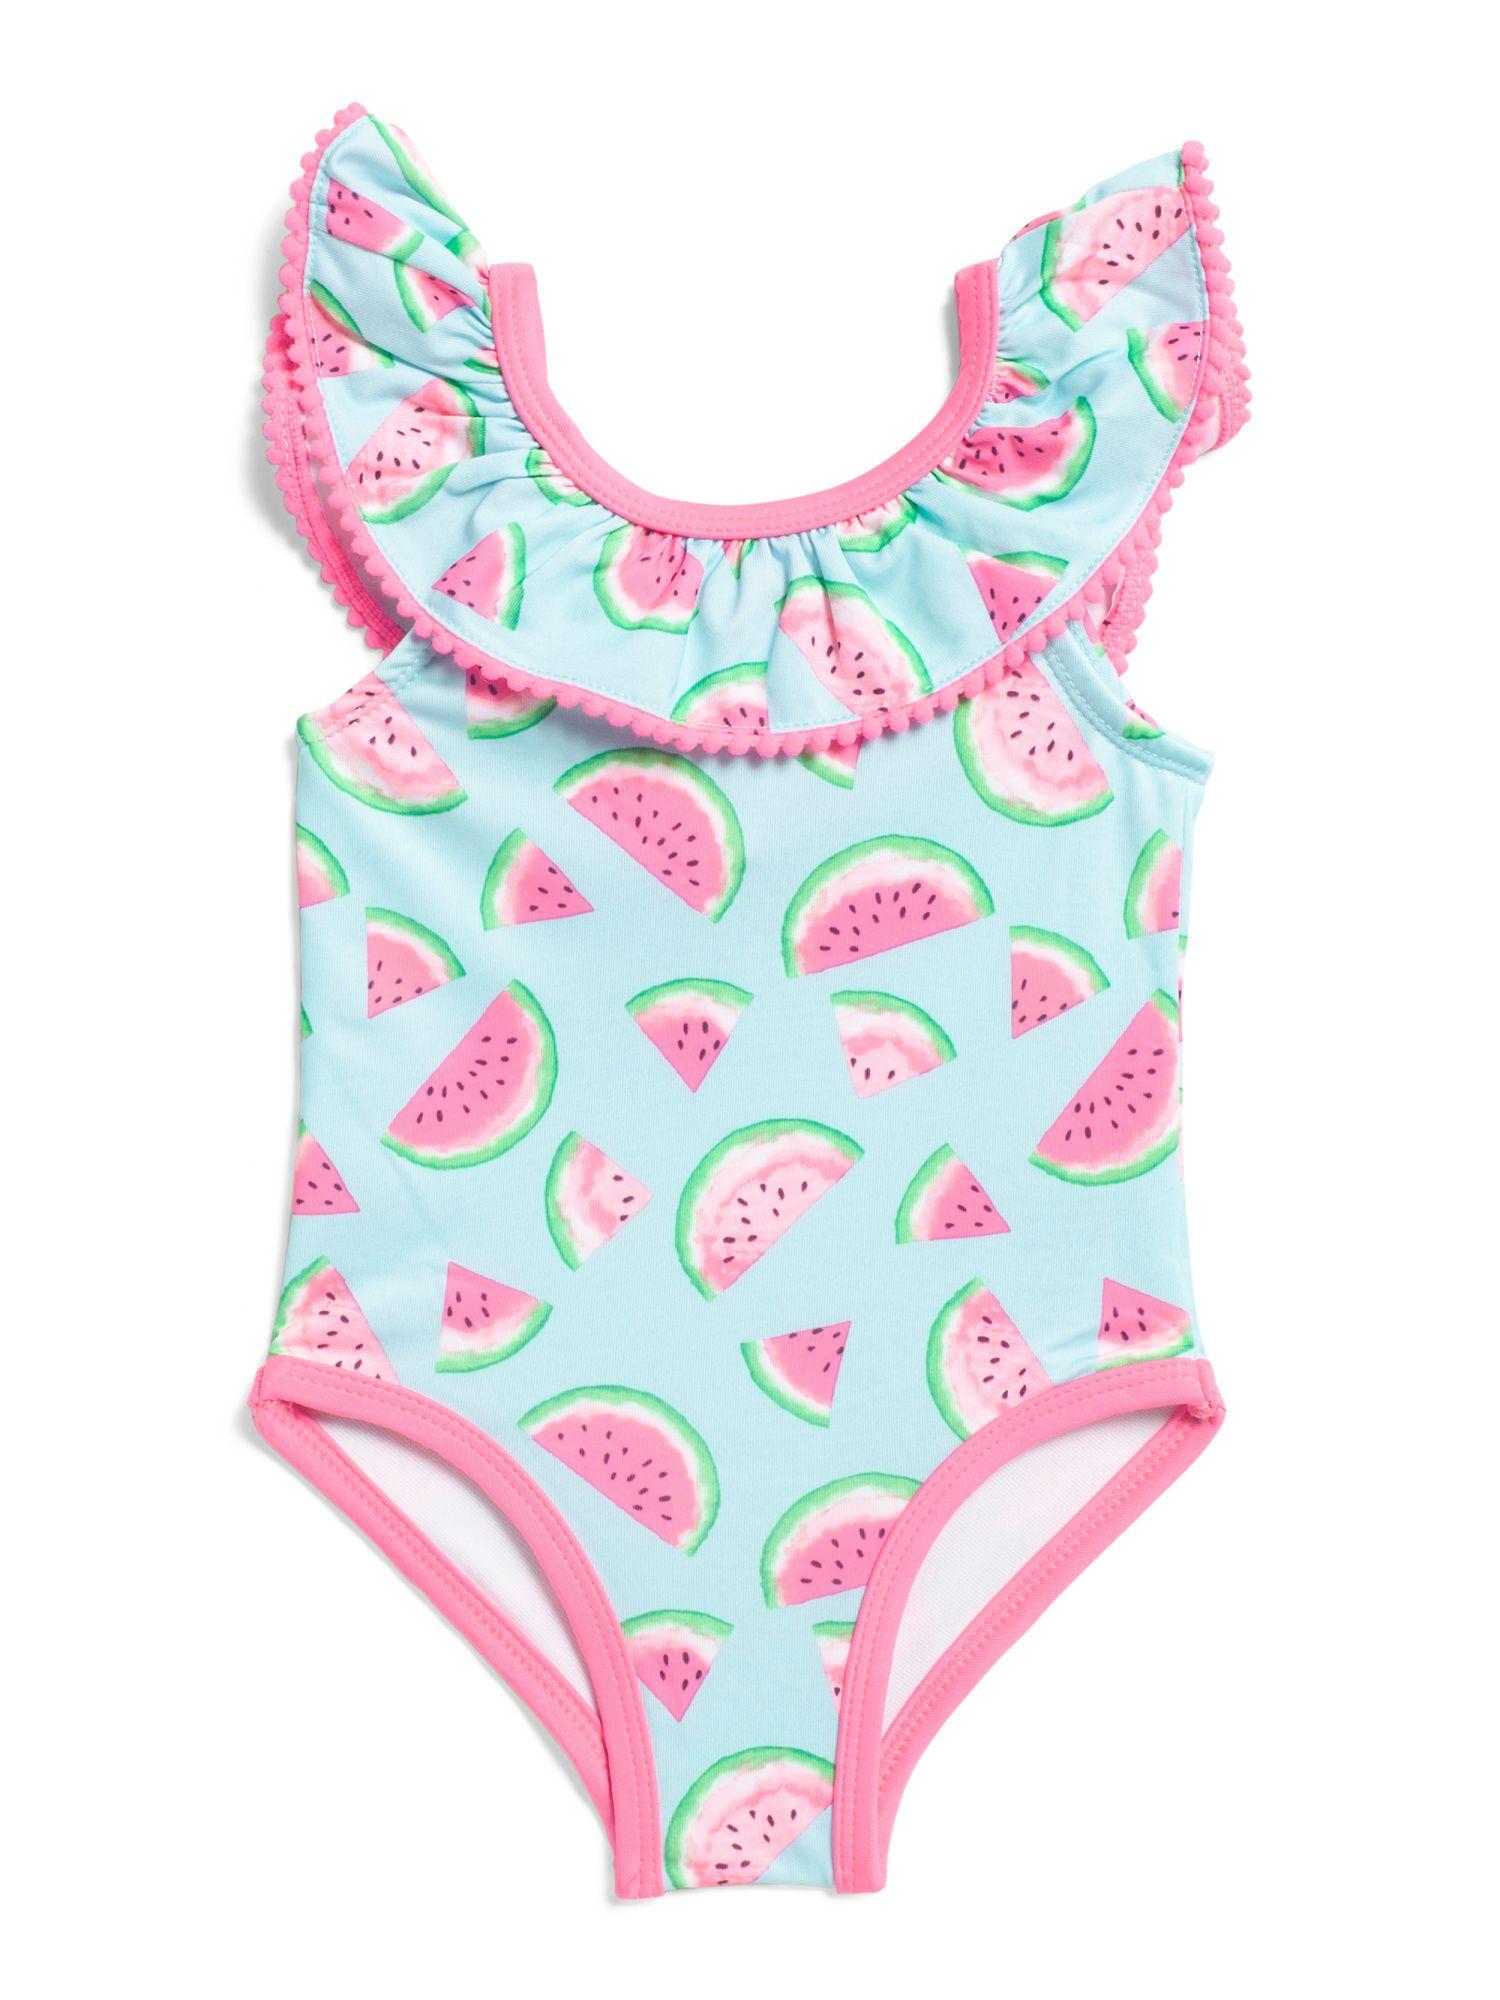 b974638078c2a Toddler Girls Watermelon One-piece Swimsuit - New Arrivals - T.J.Maxx